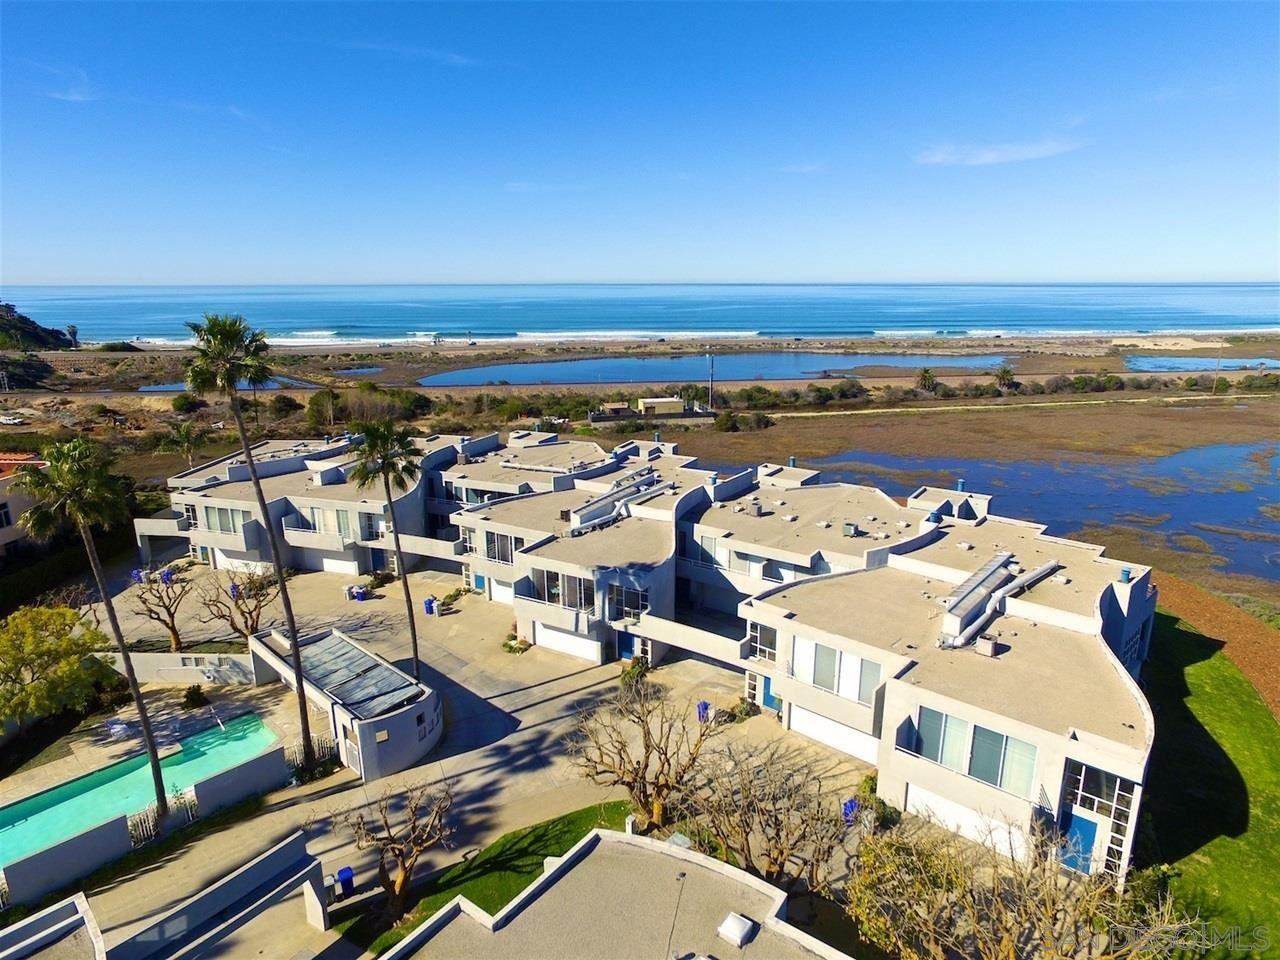 Photo of 166 Solana Point Cir, Solana Beach, CA 92075 (MLS # 210005008)